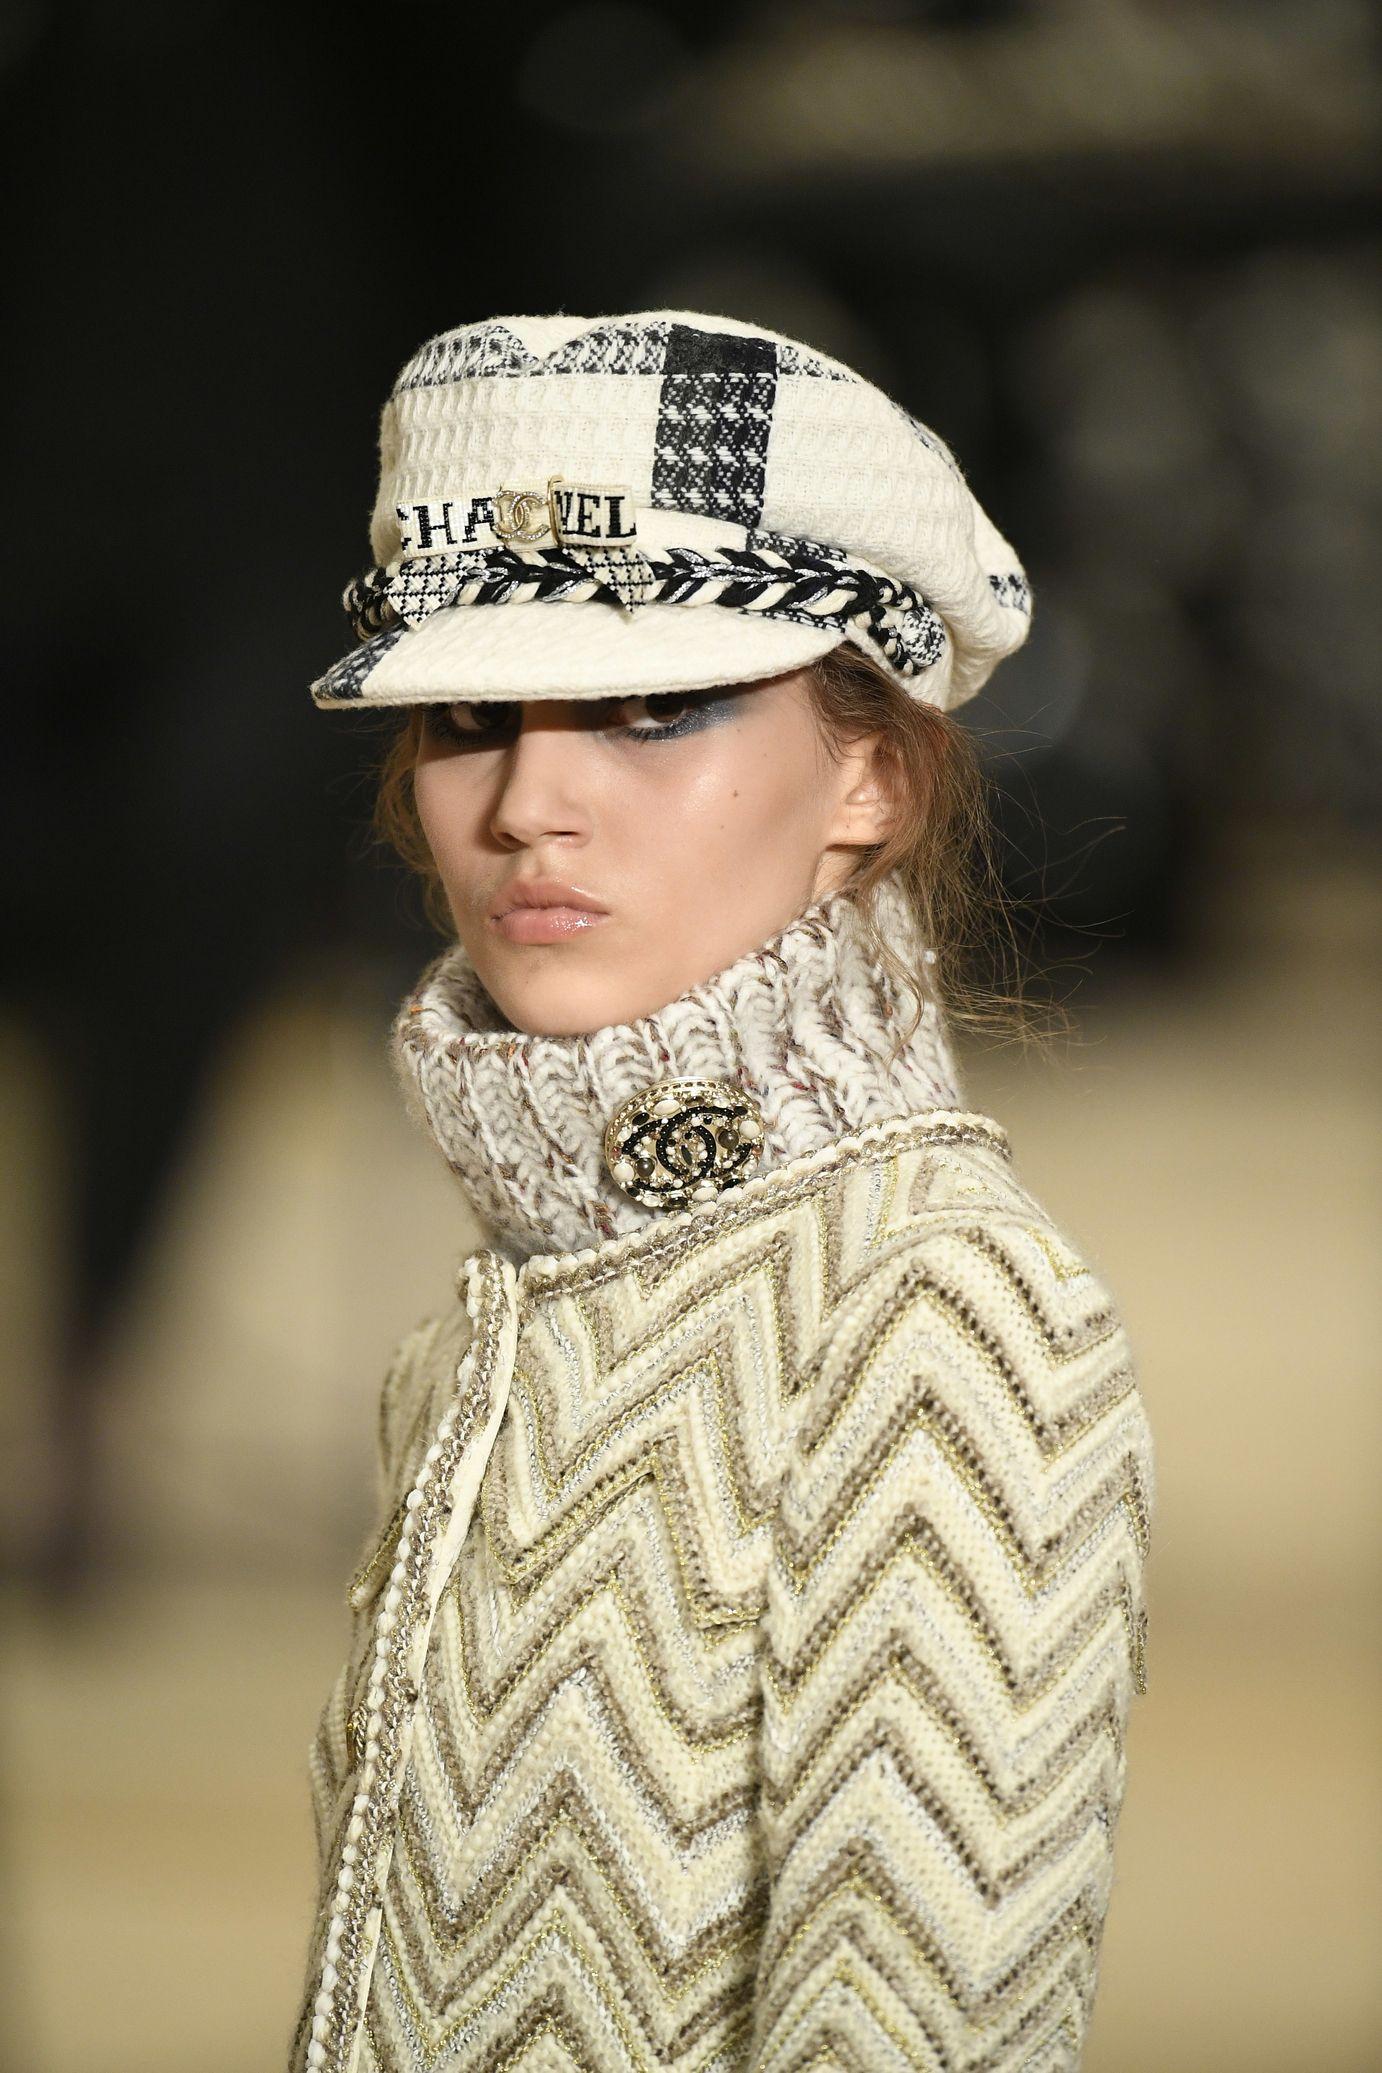 f70592ed Défilés | Accessories. Style ♕ ⚜ ✤ | Chanel hat, Chanel handbags ...